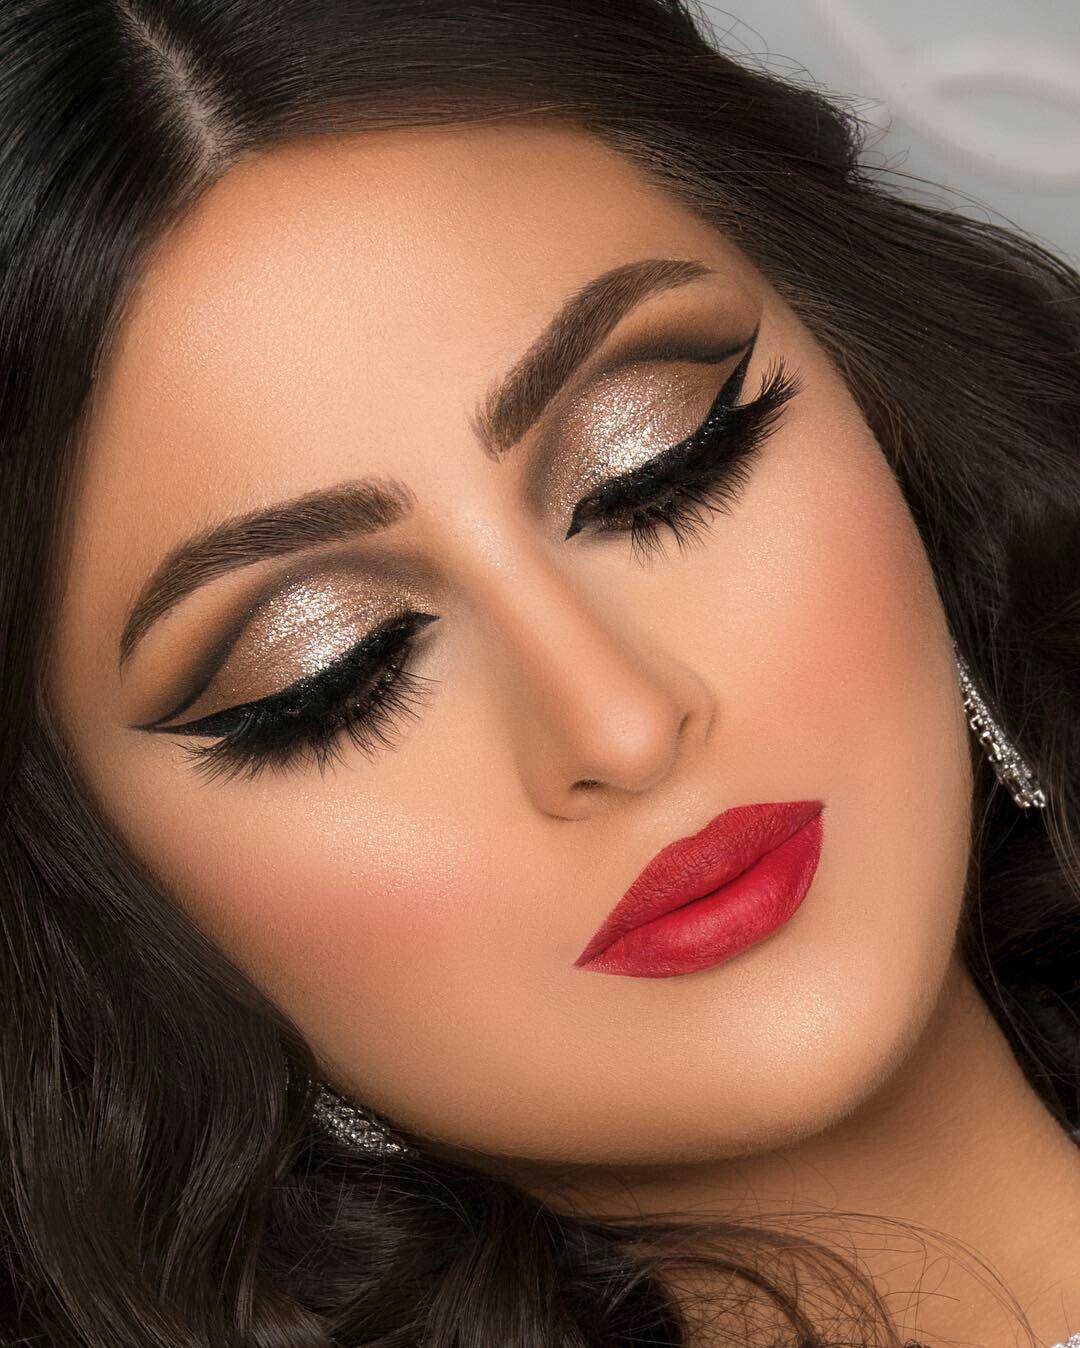 Pin By Jody Weef On Beaute Beautiful Girl Makeup Bridesmaid Hair Makeup Bridal Makeup Looks